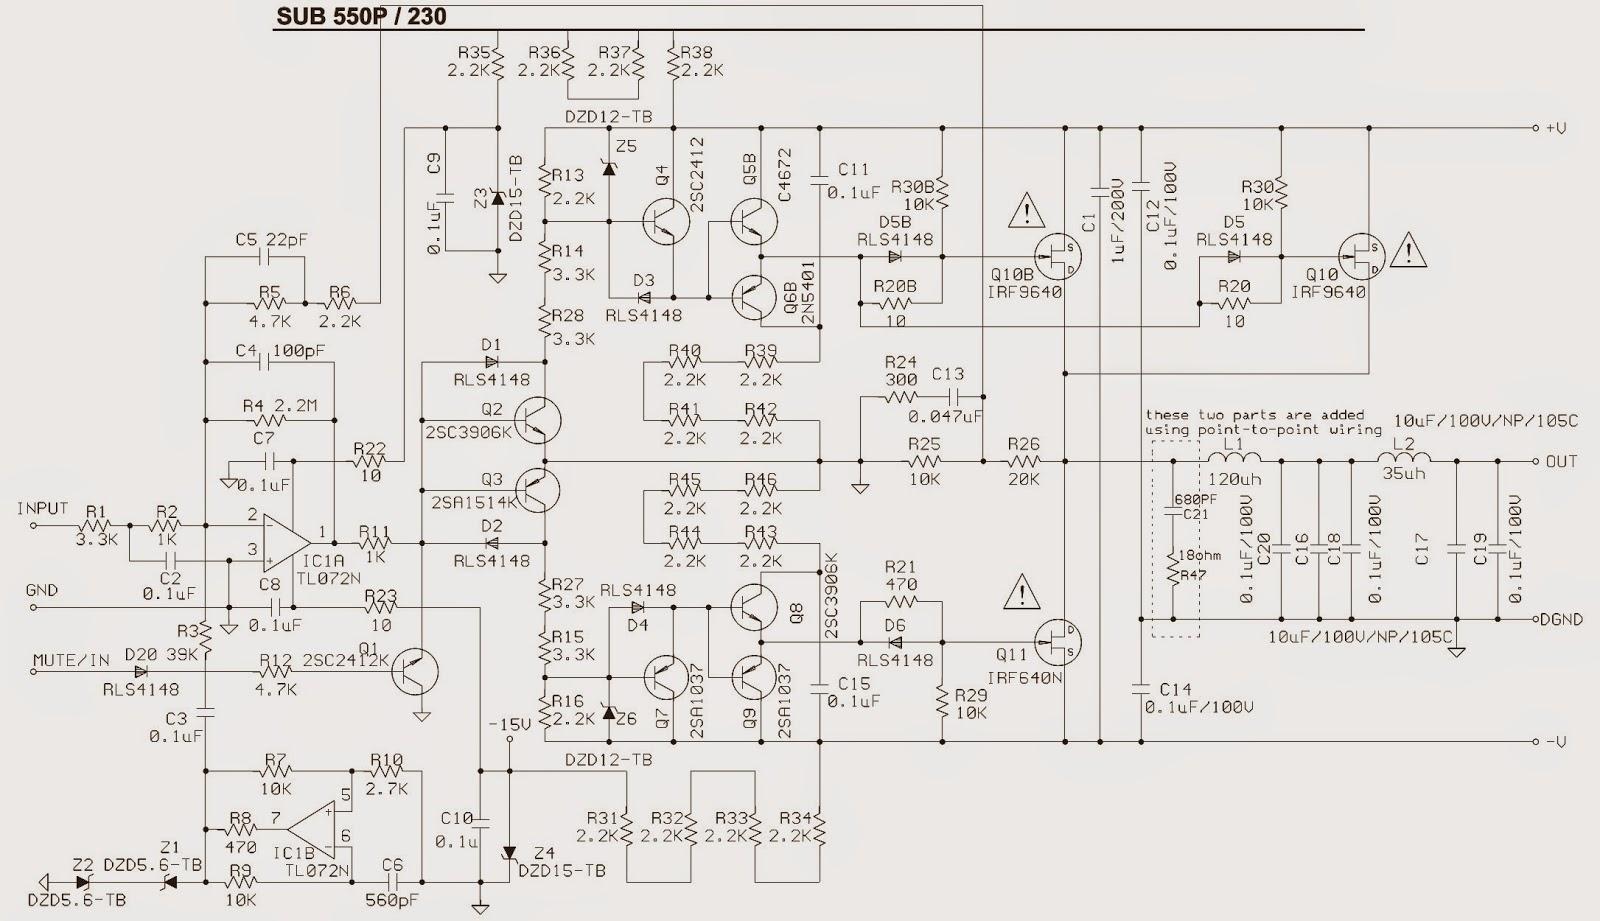 Sub550p Jbl Amplifier Sub Woofer